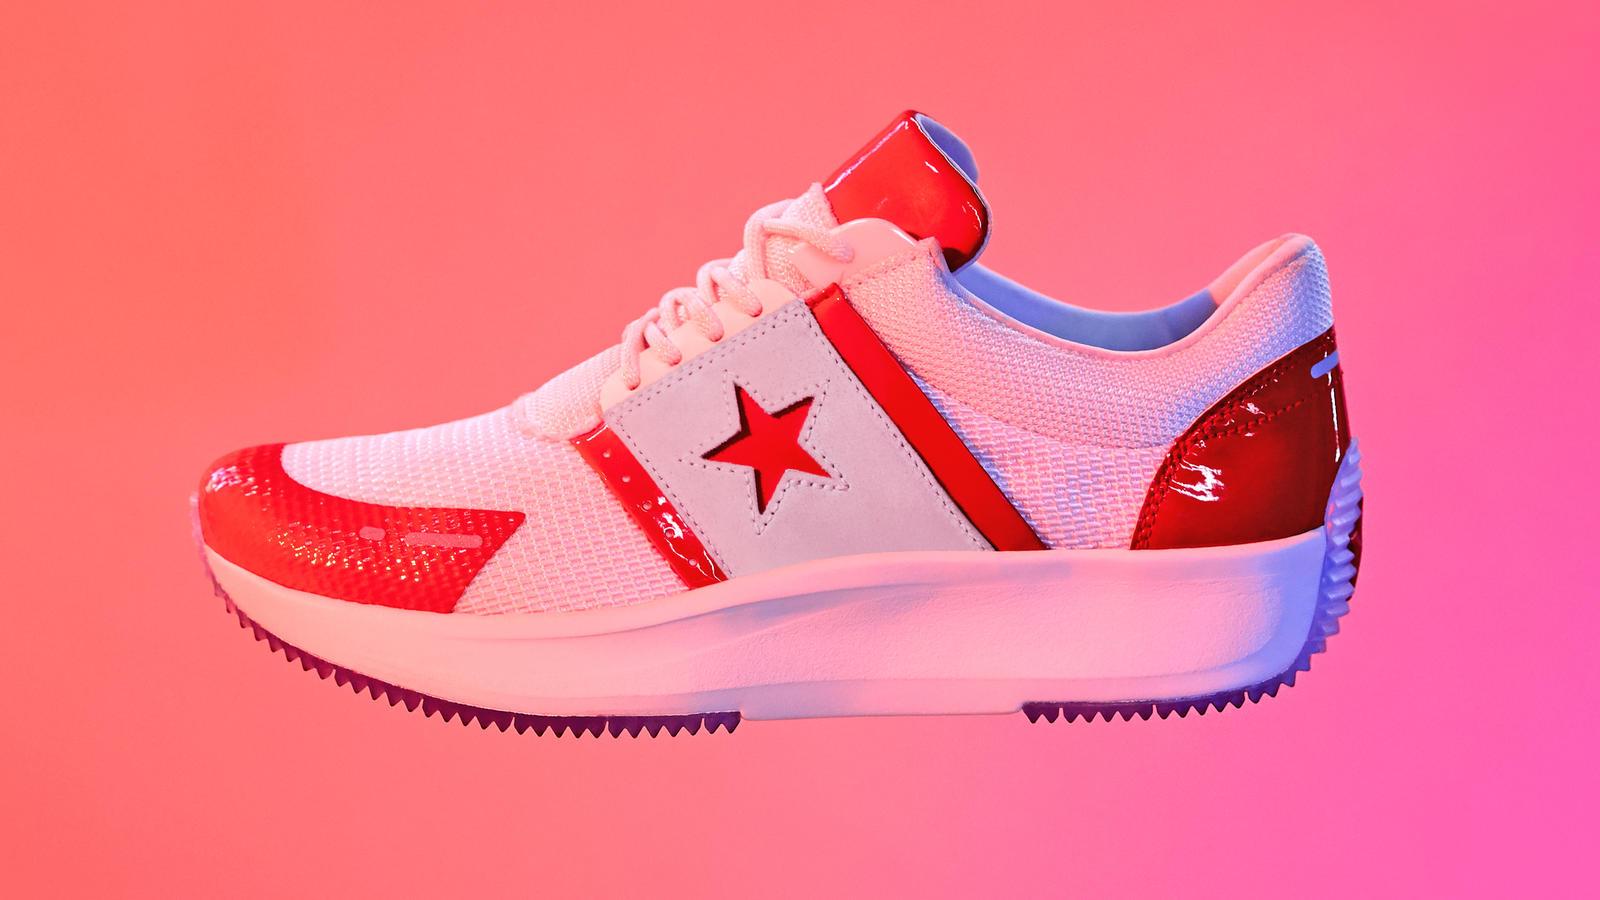 d8ceba7bc29 Converse Run Star - Nike News